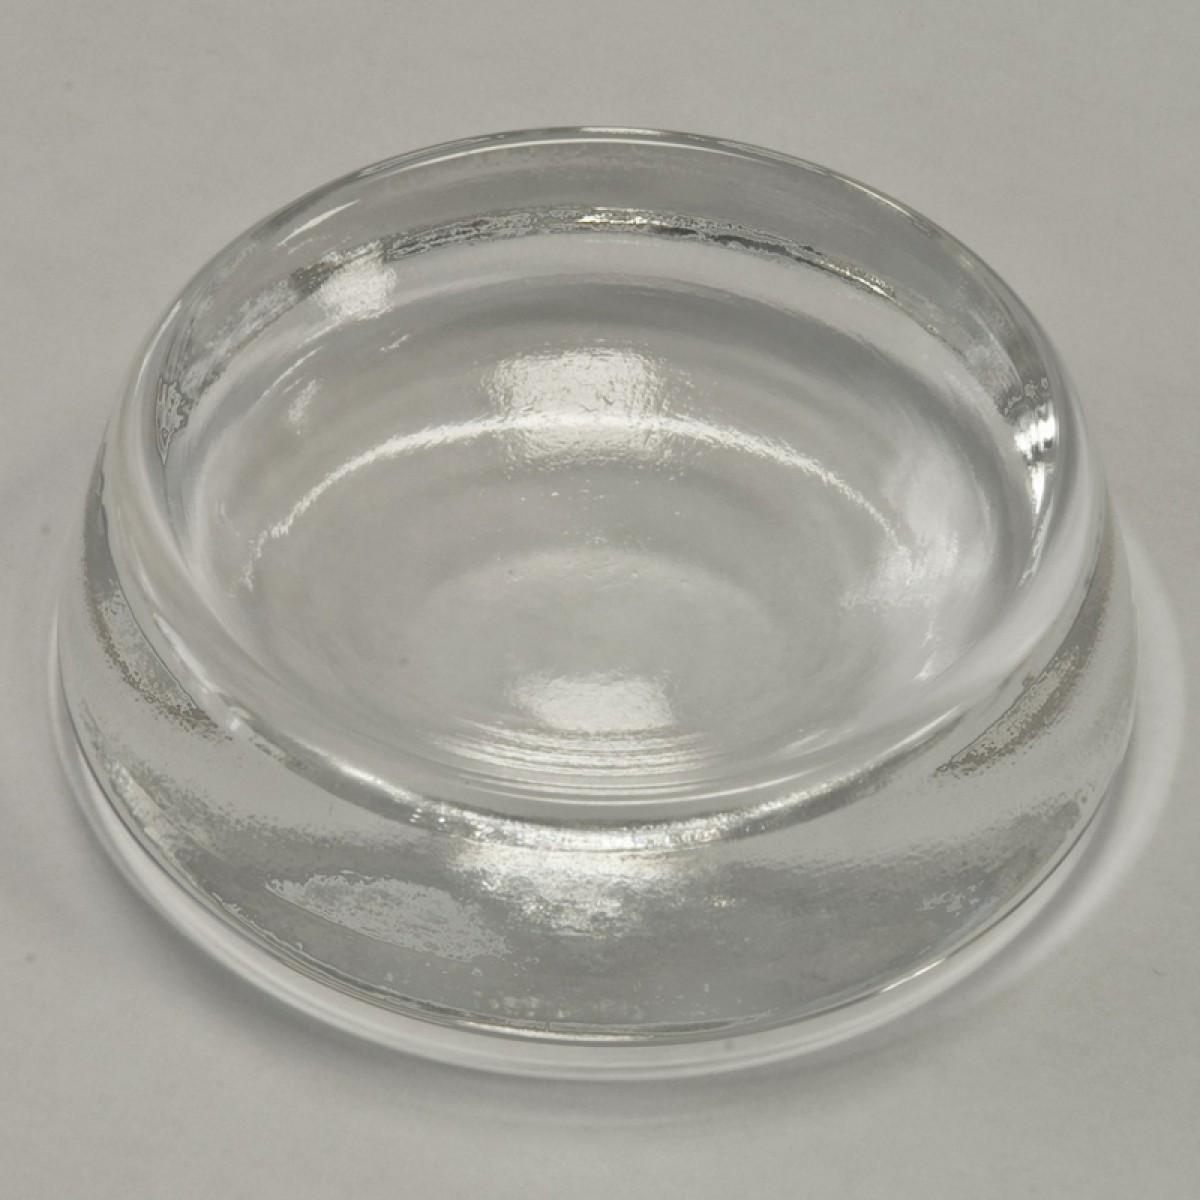 glasuntersetzer-klavier-fluegel